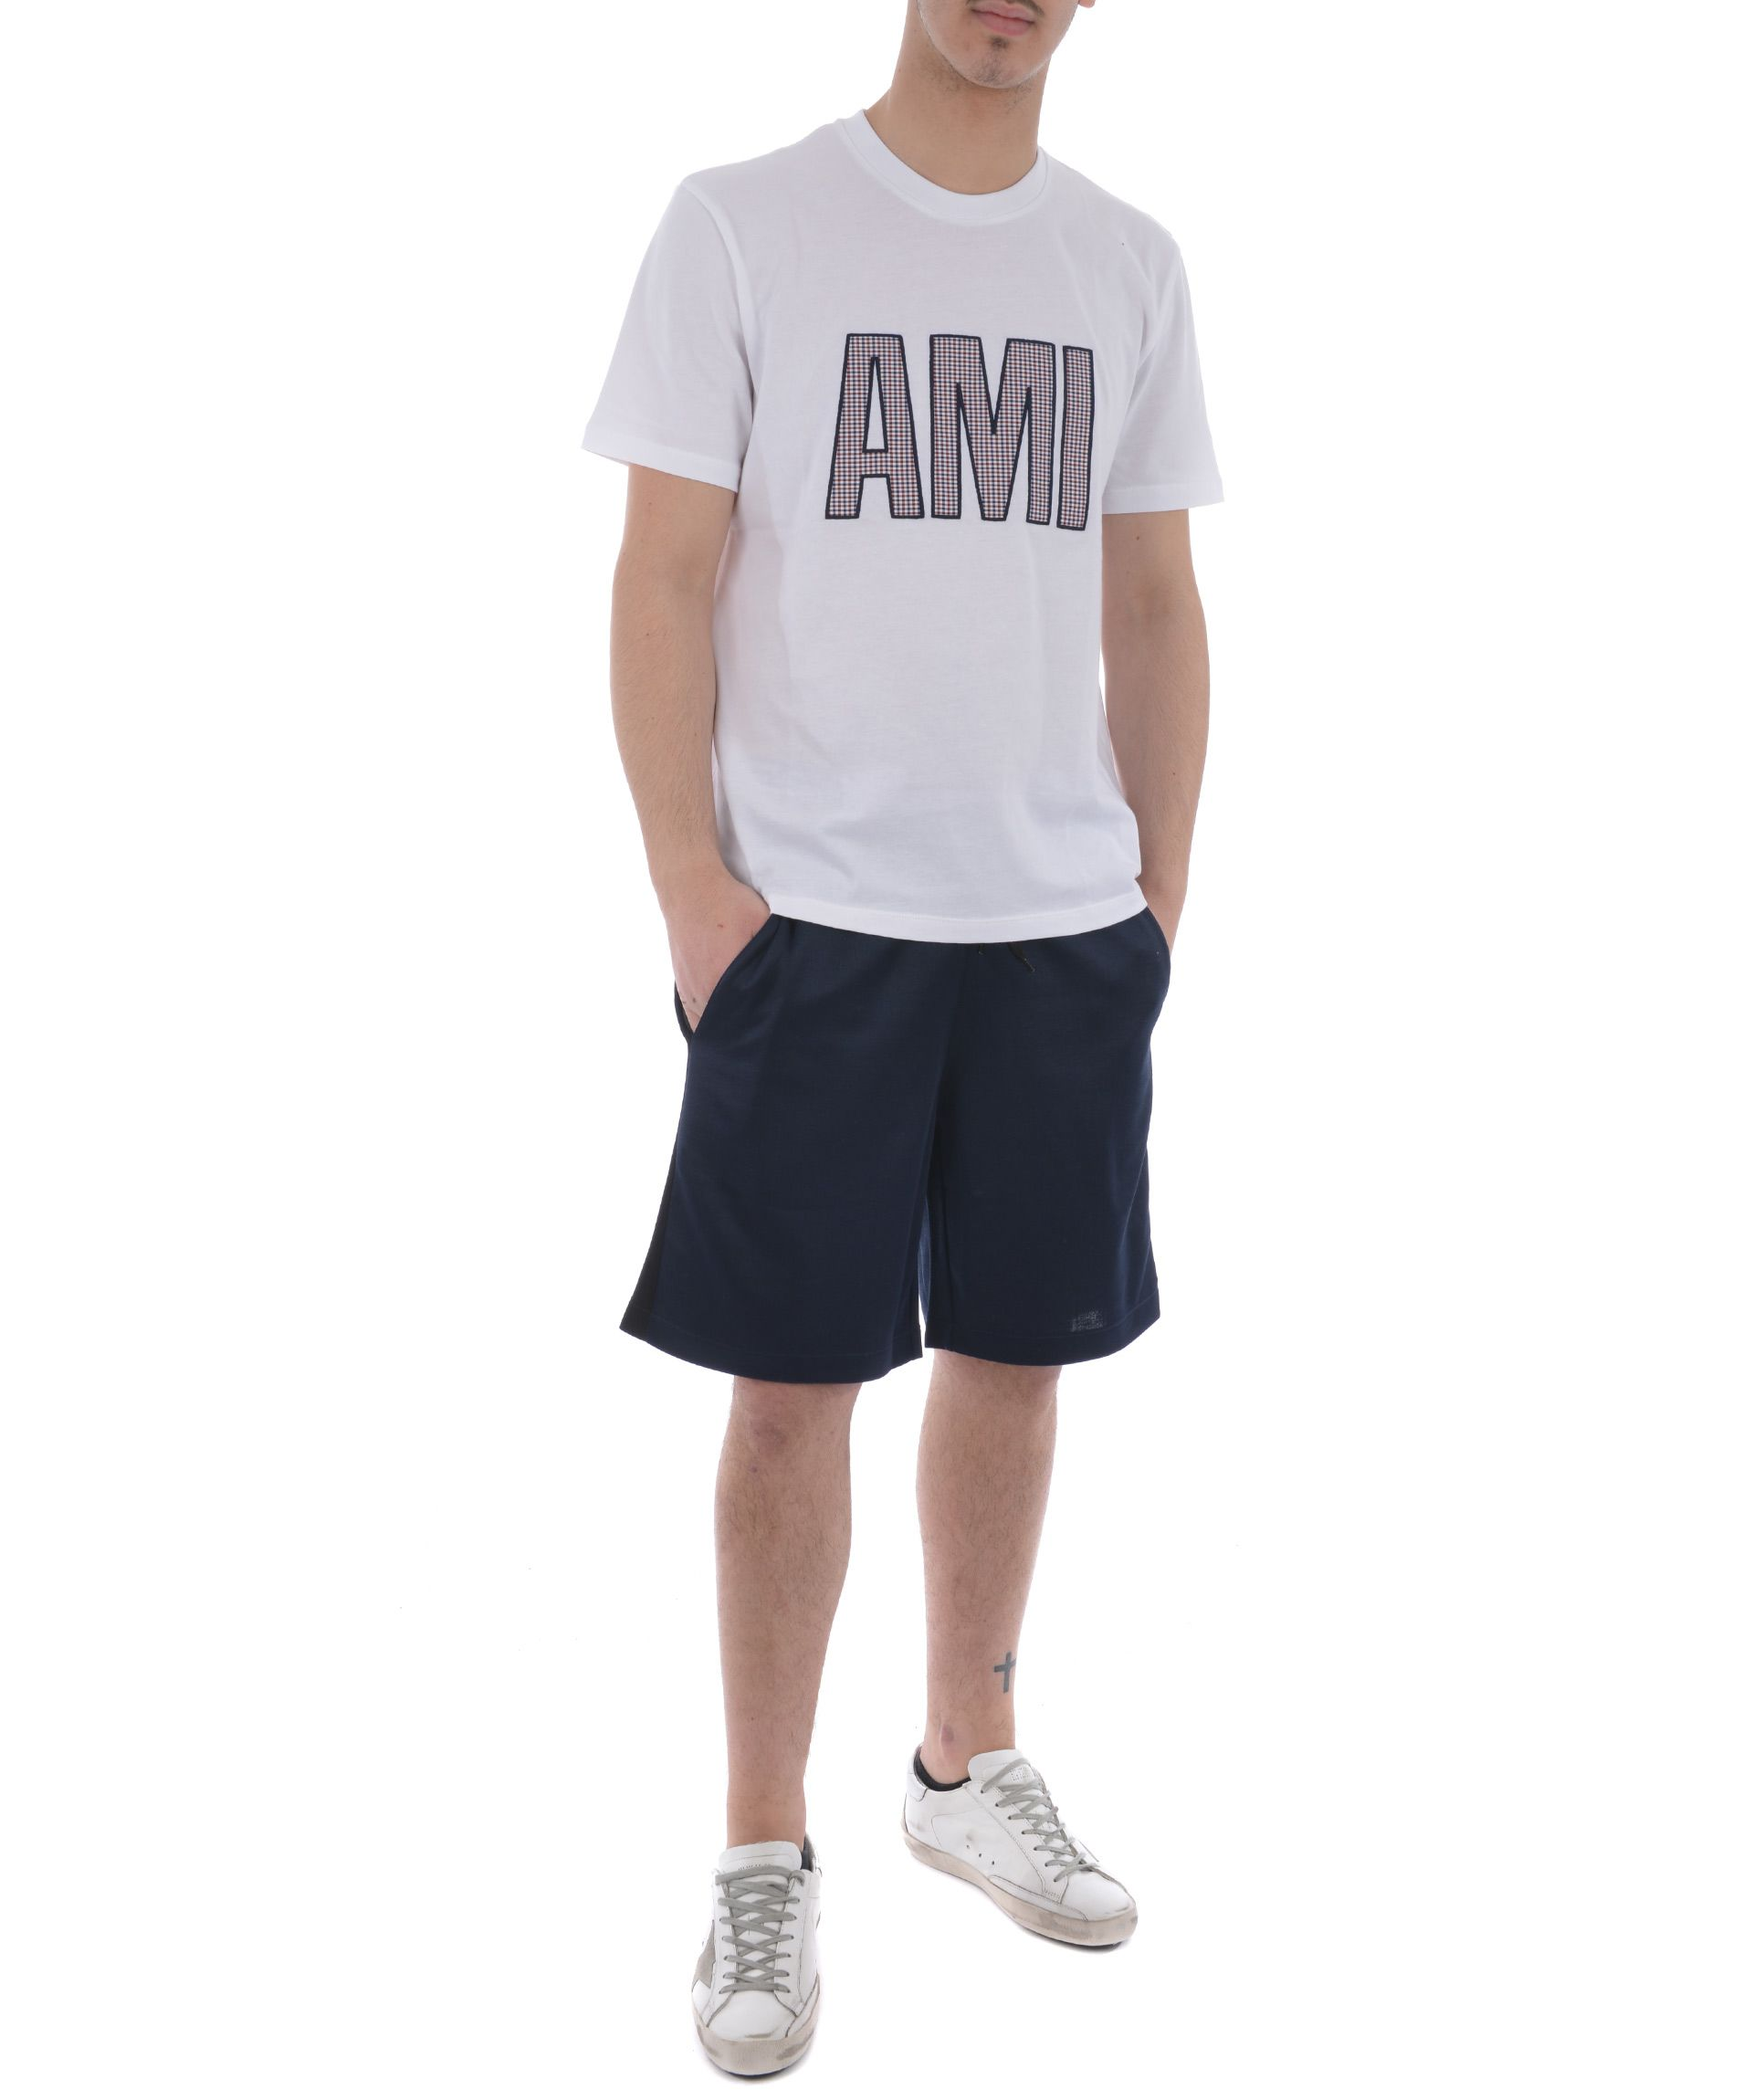 Ami Alexandre Mattiussi Crew Neck T-shirt